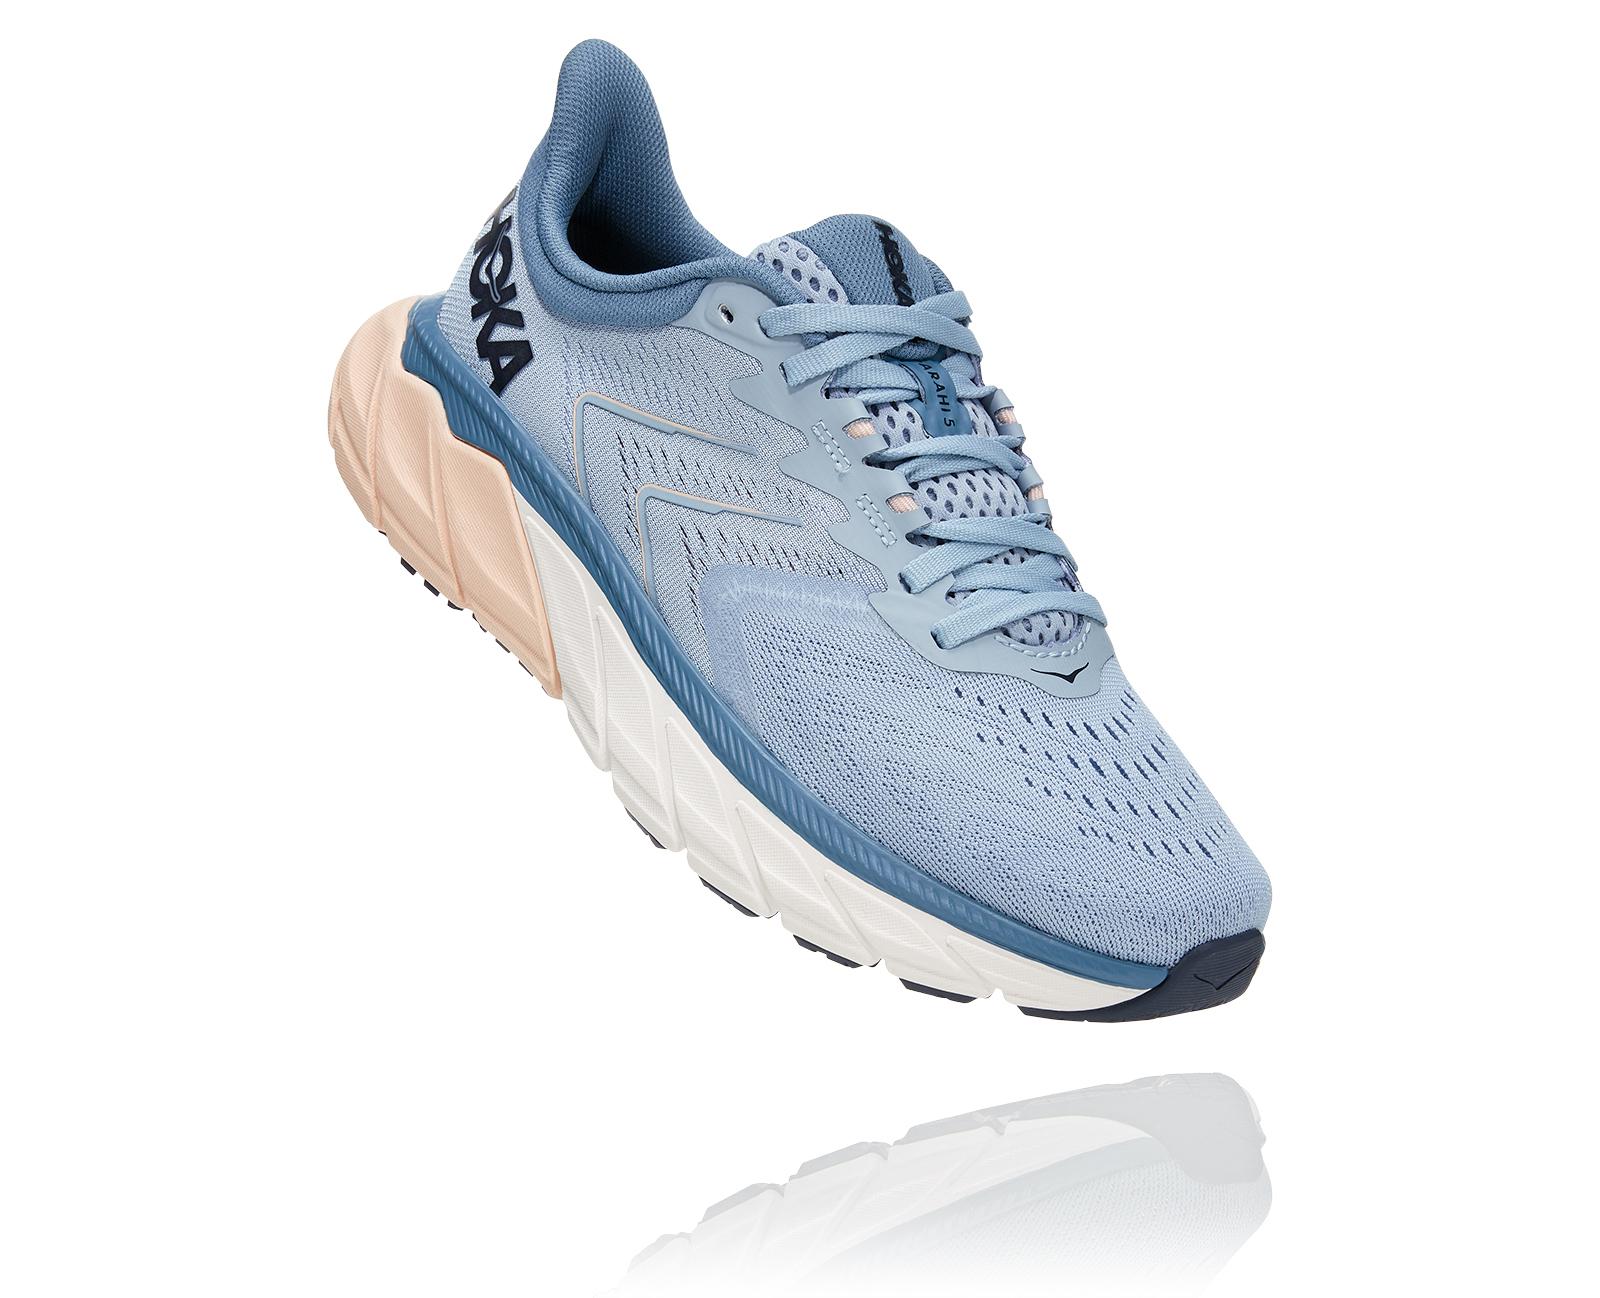 Women's Arahi 5 - Hoka One One Athletic Shoes-Hoka One One